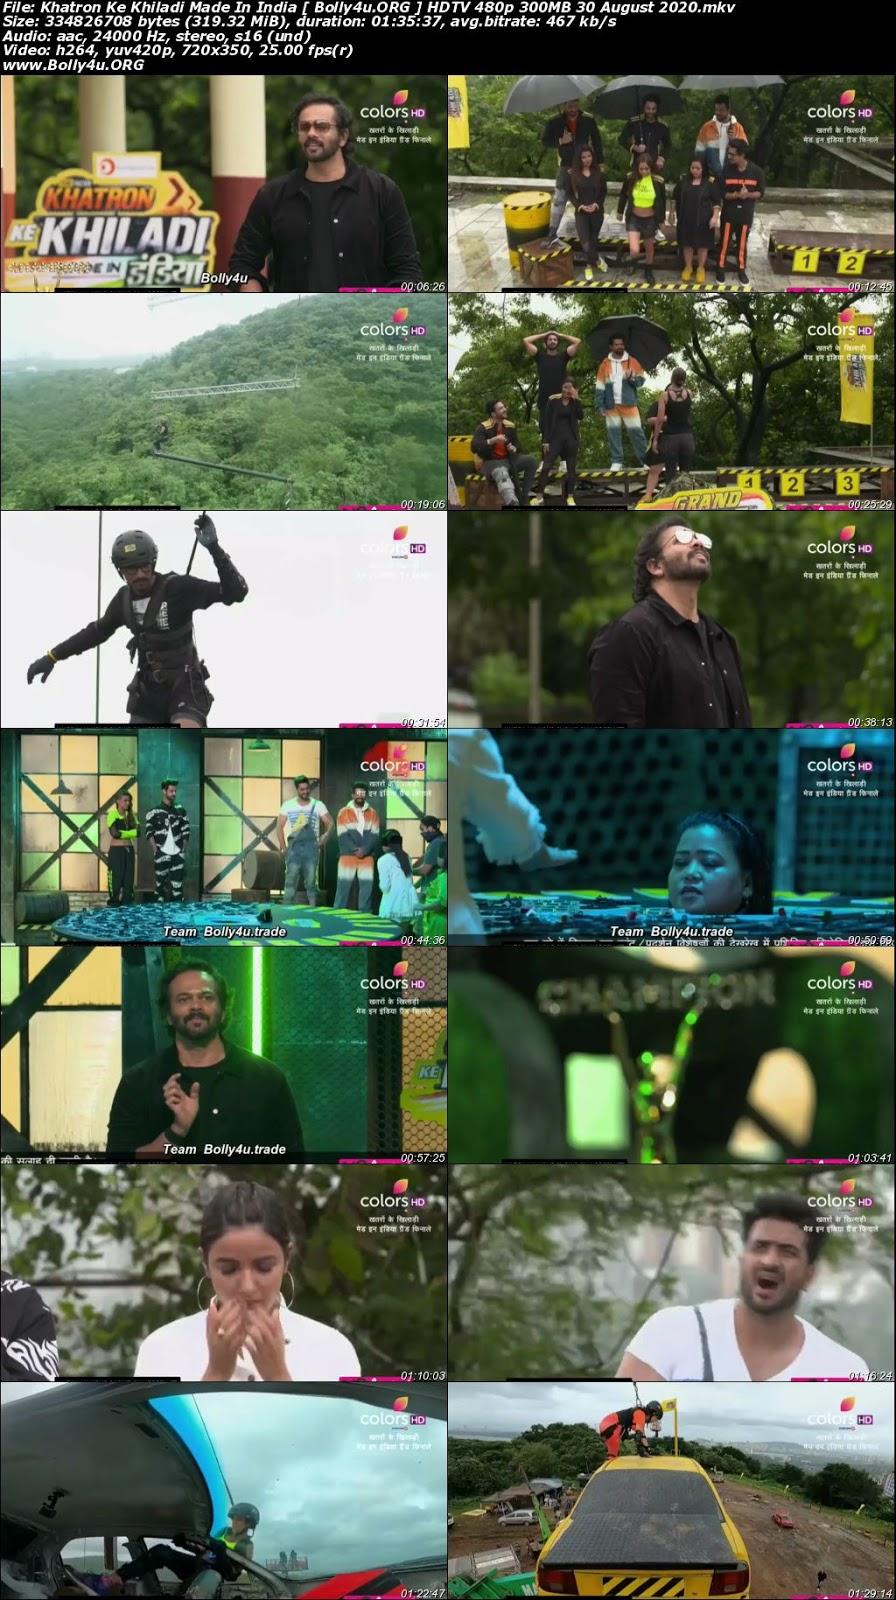 Khatron Ke Khiladi HDTV 480p 300MB 30 August 2020 Download